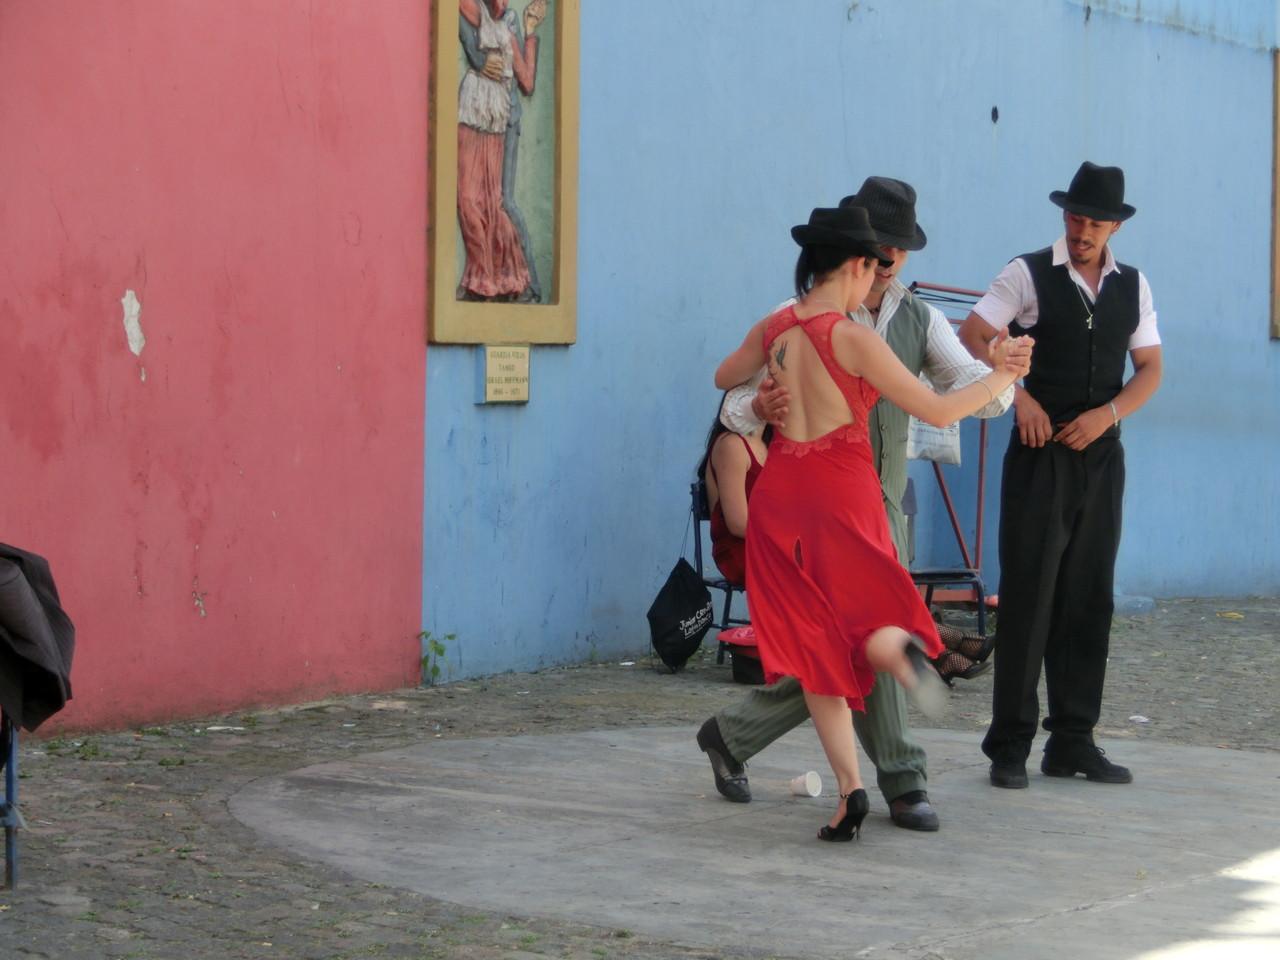 Tangovorführung